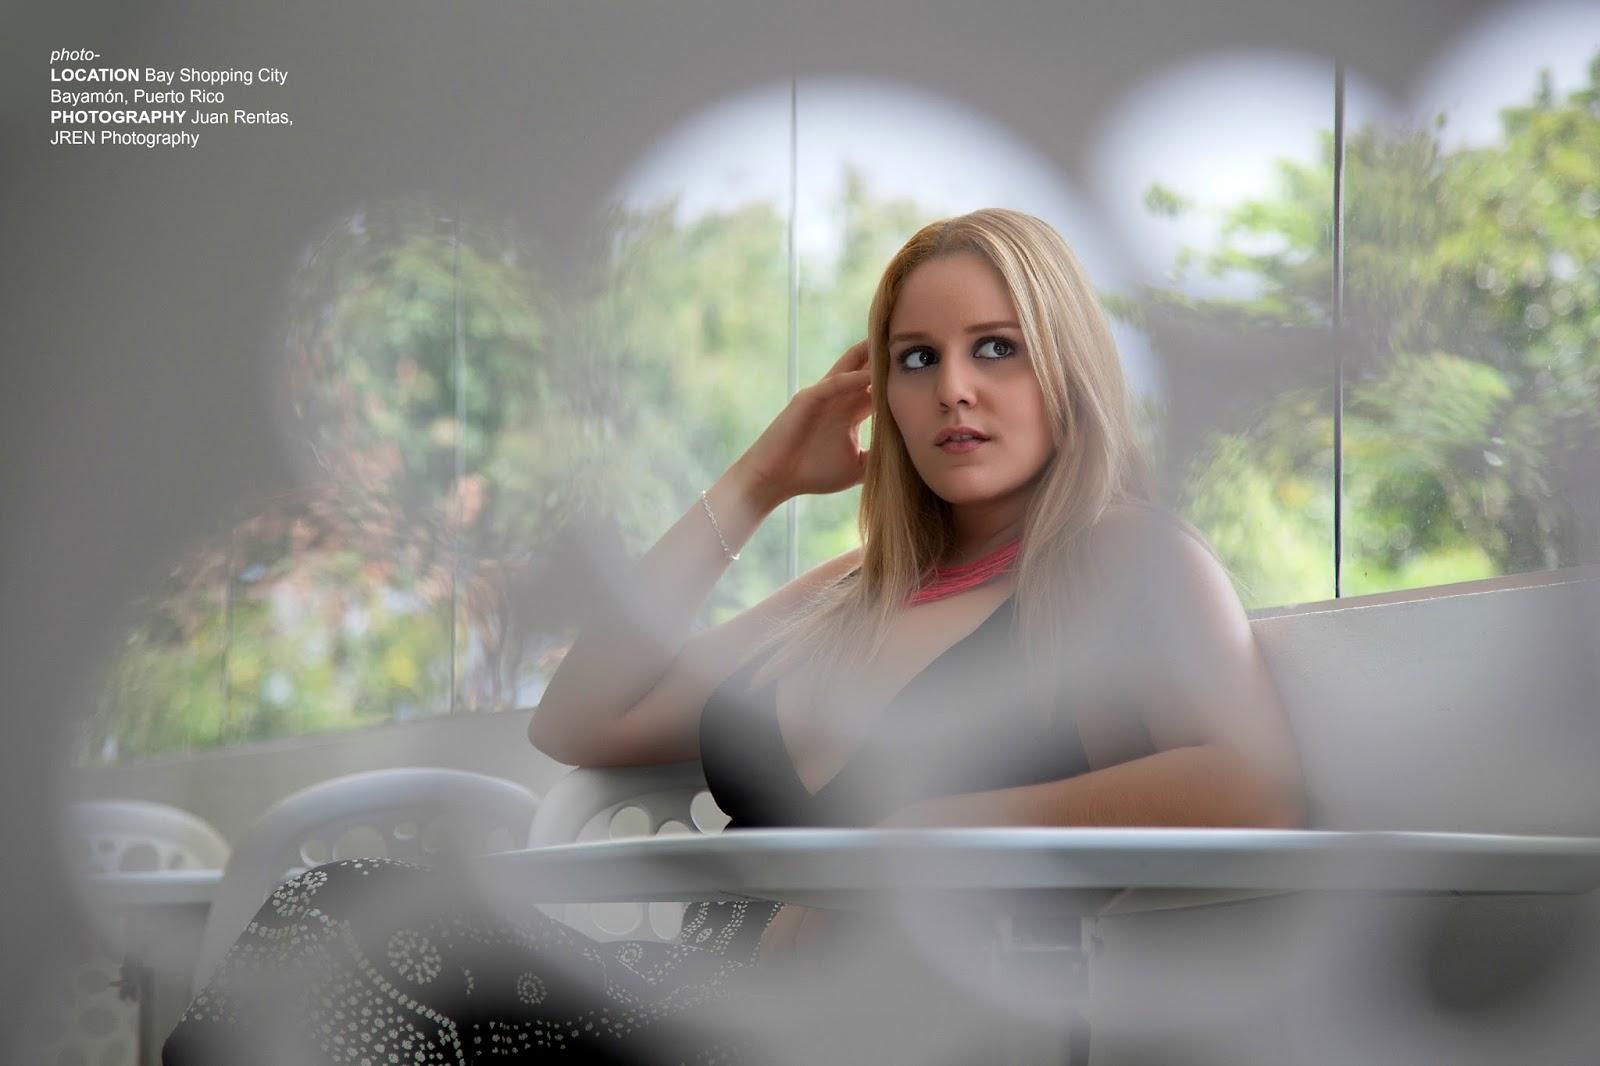 JREN Photography - Natalia Bosch